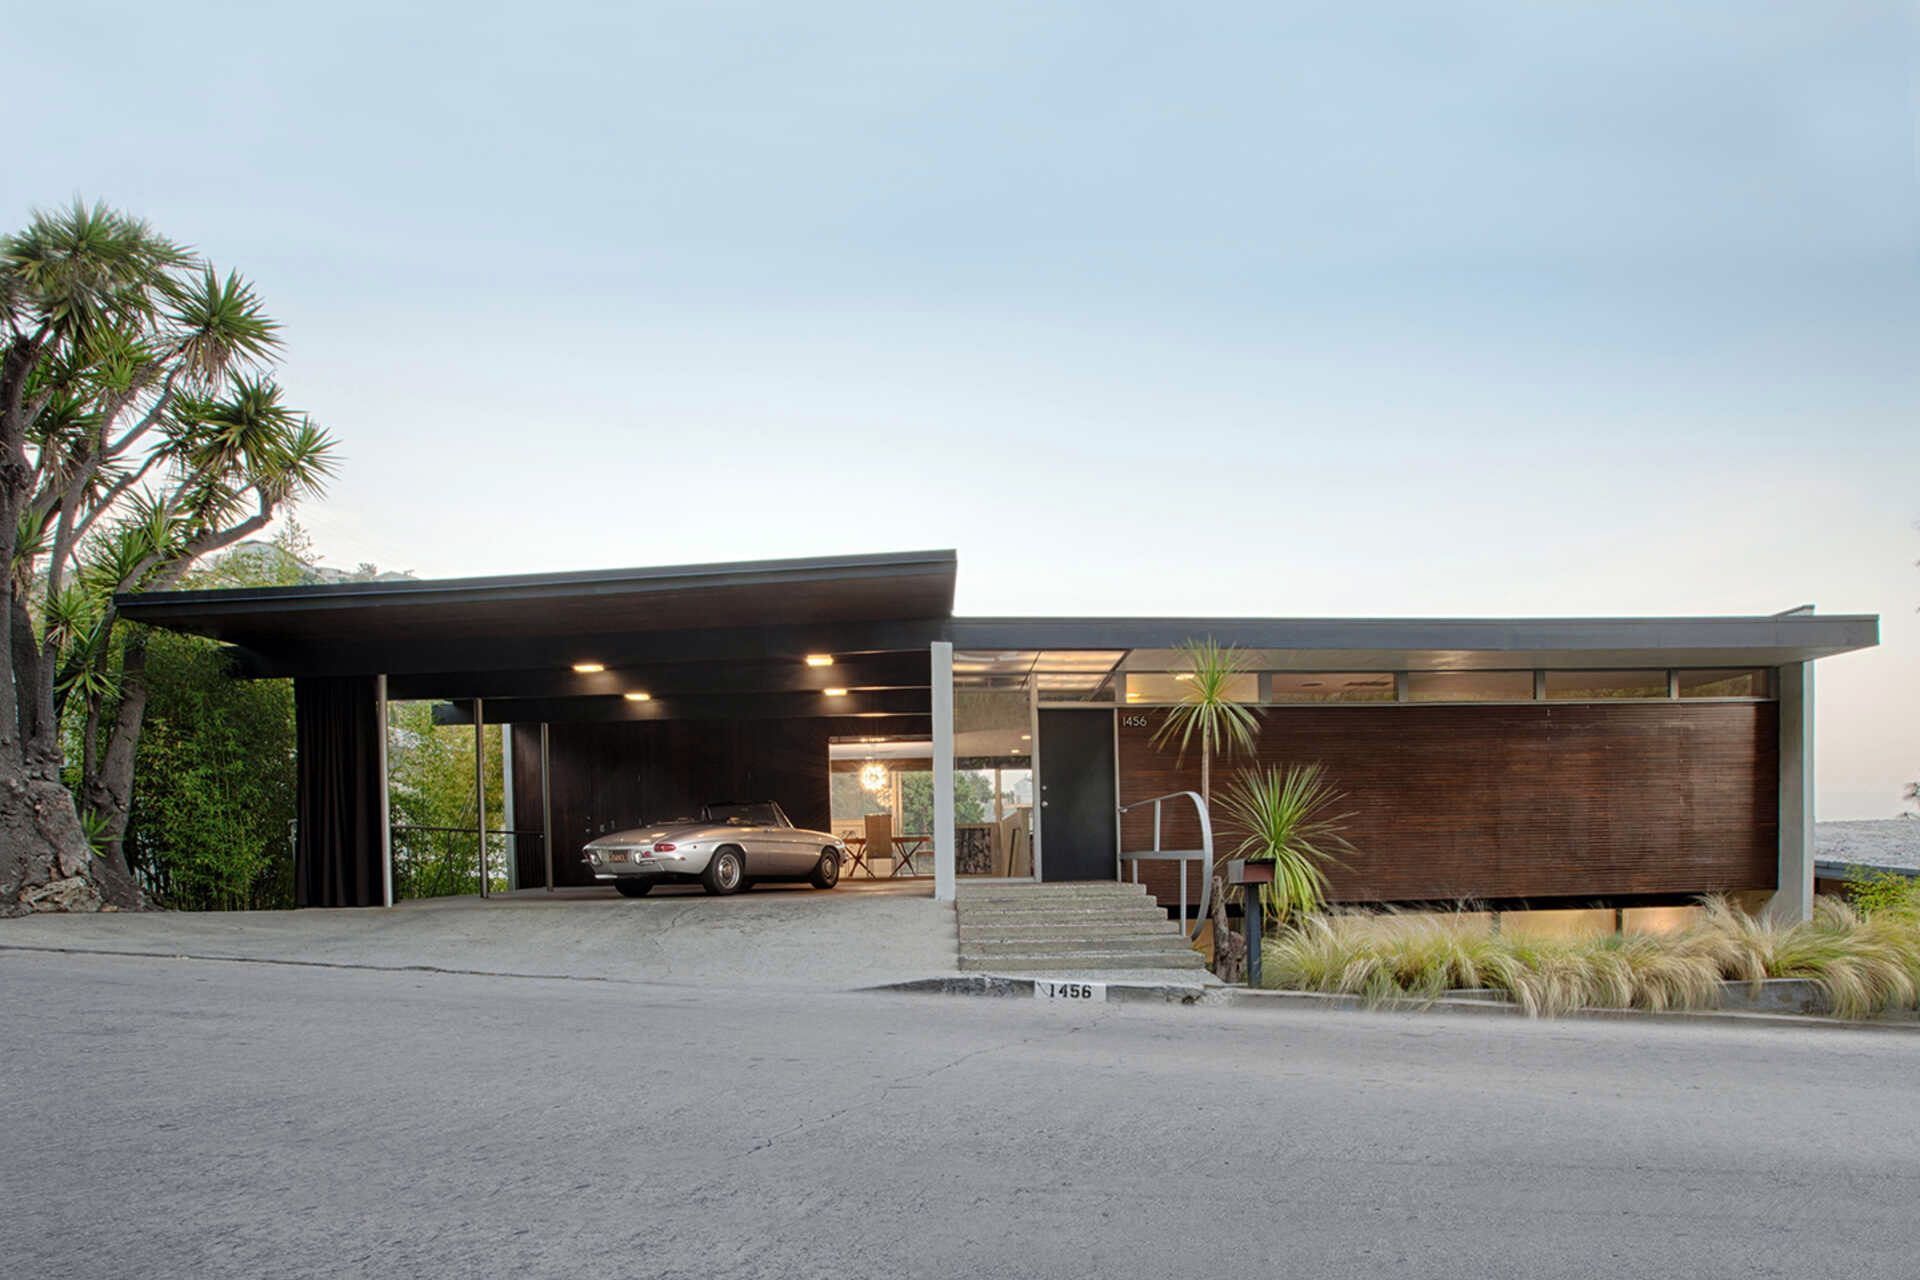 Richard Neutra's Lew House